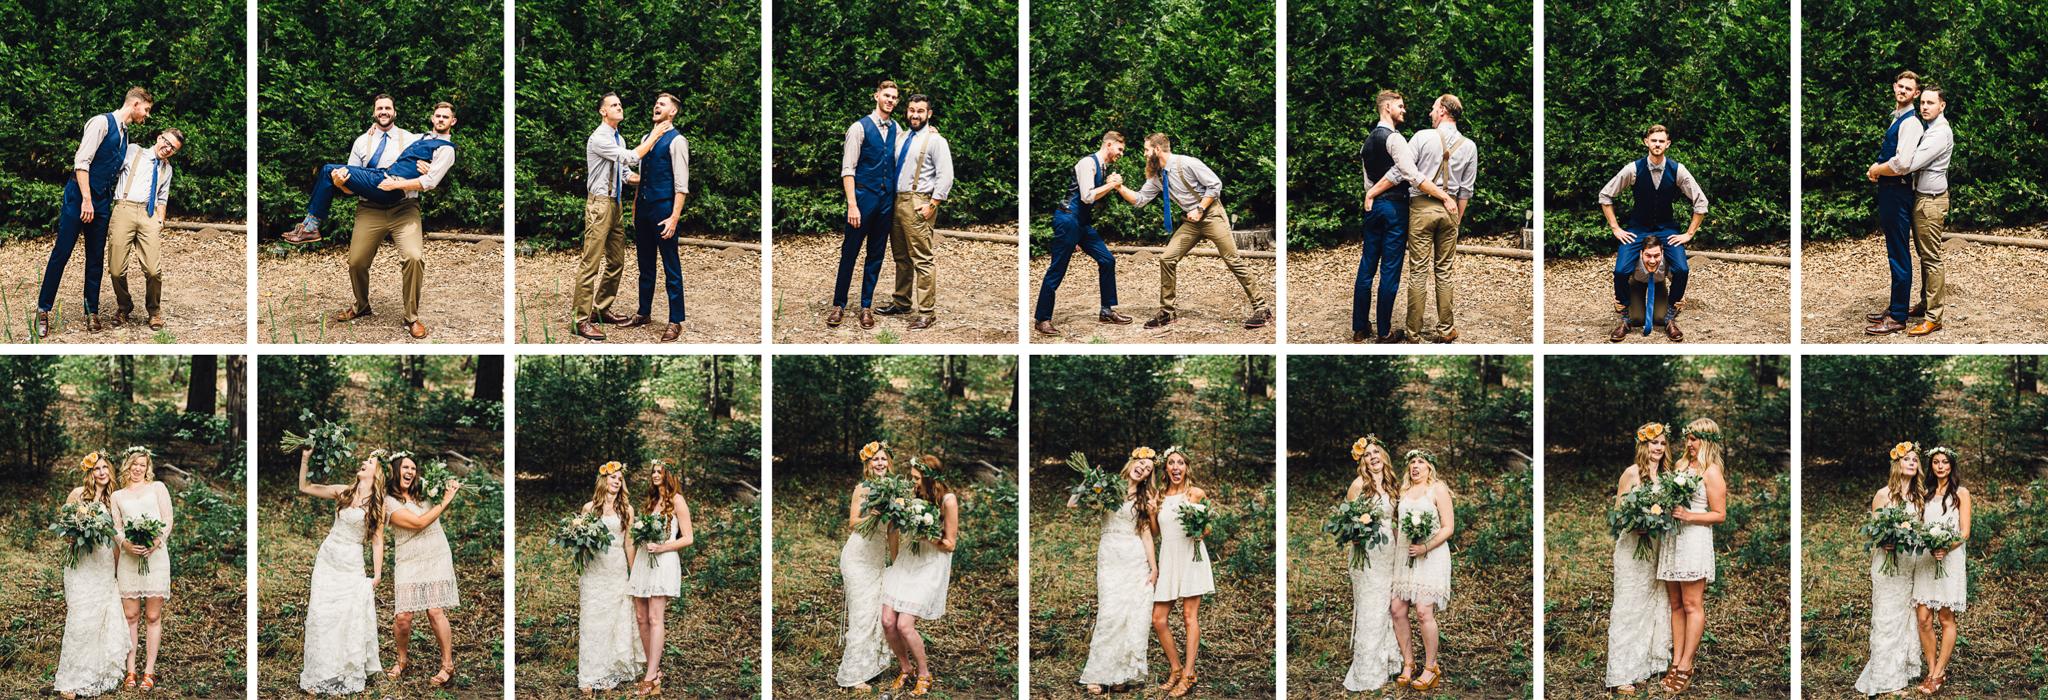 ©Isaiah & Taylor Photography - Pine Rose Cabin - Lake Arrowhead - Los Angeles Wedding Photographer-093.jpg